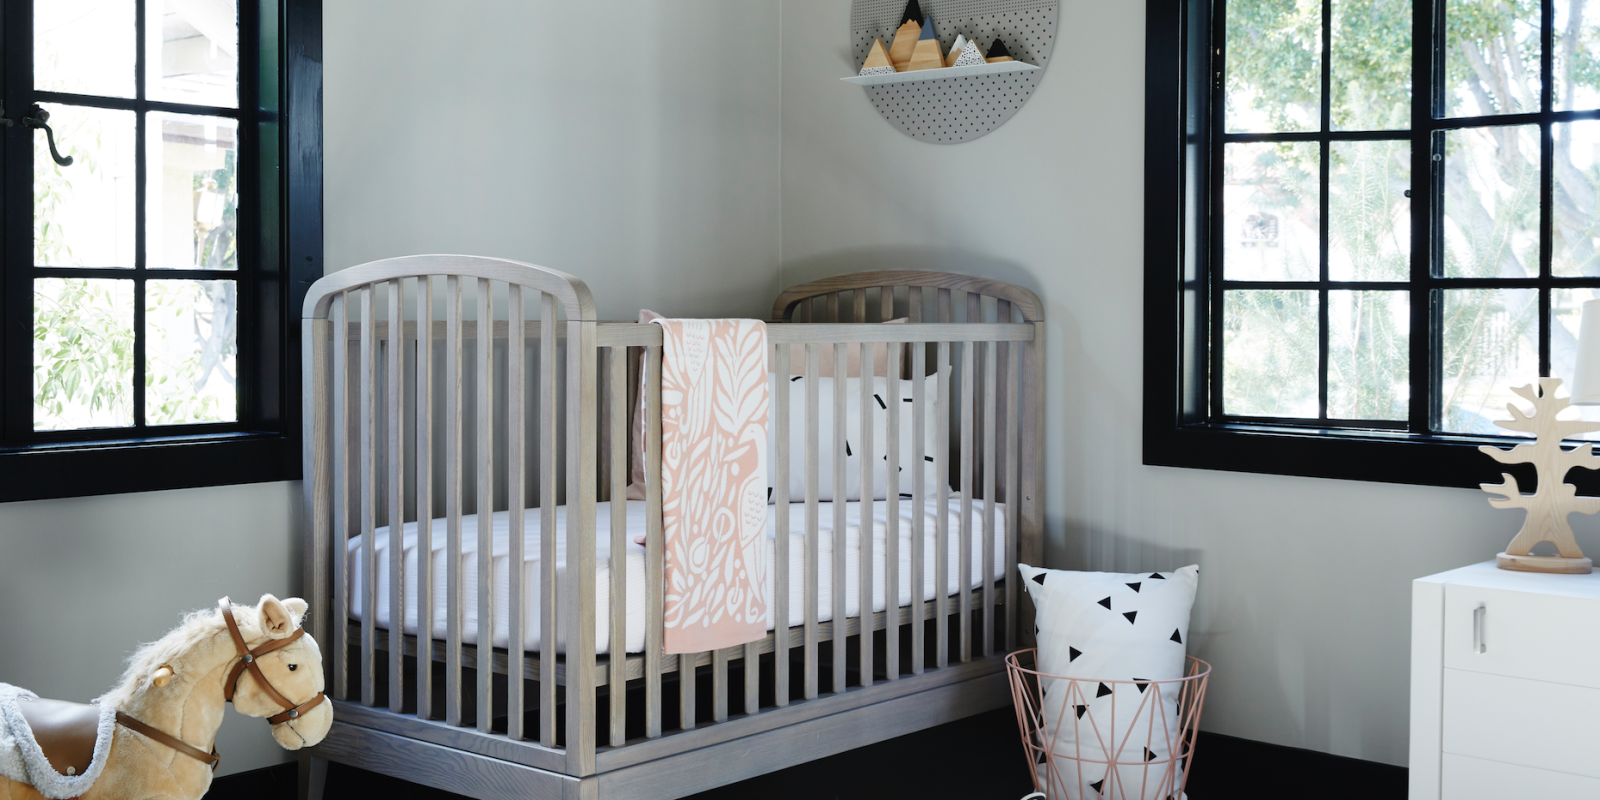 7 cute baby girl rooms nursery decorating ideas for baby for Cute baby room ideas